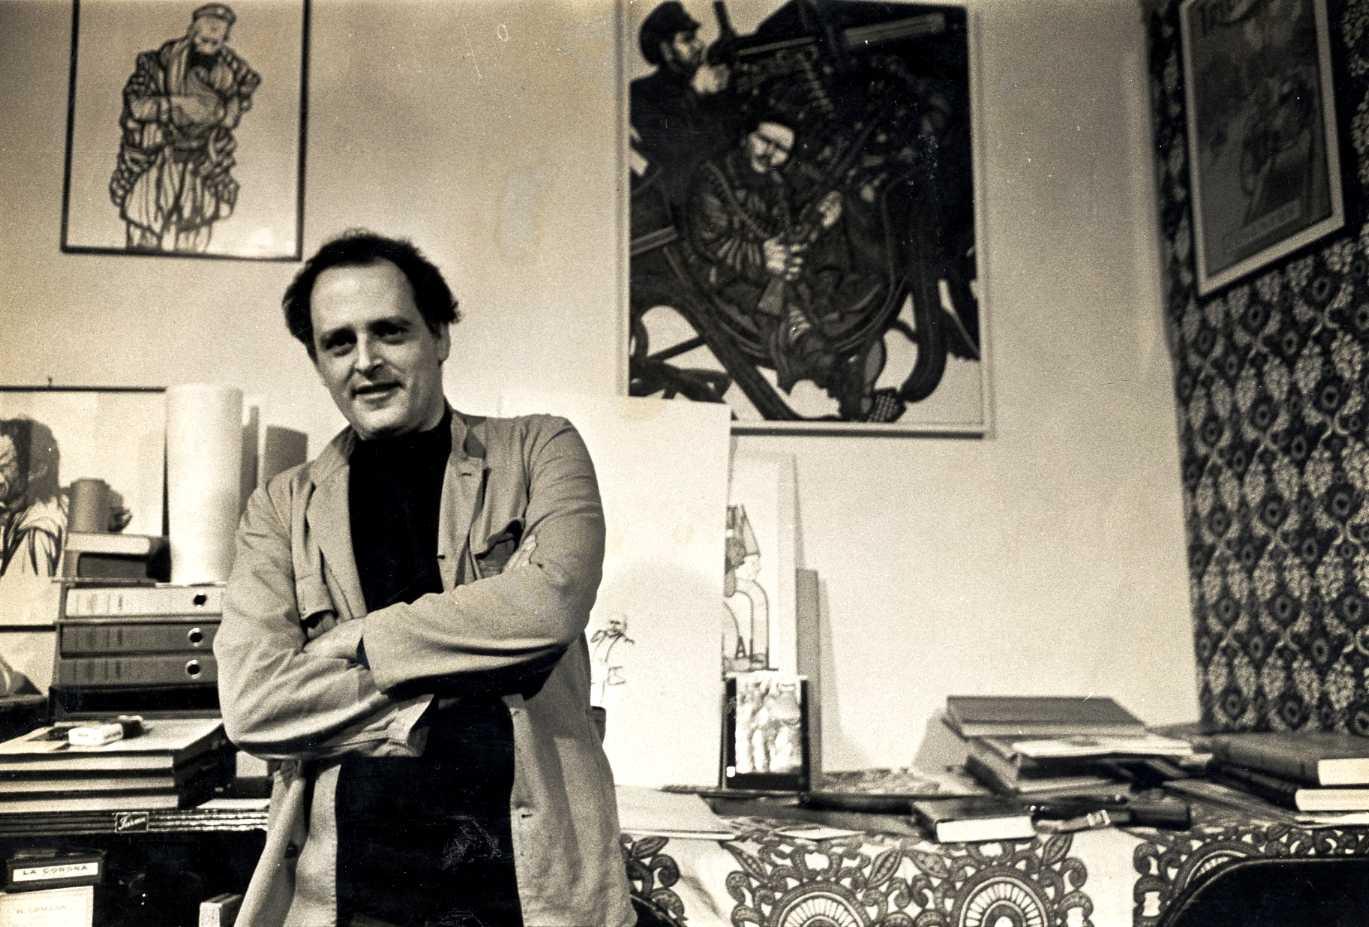 Flavio Costantini